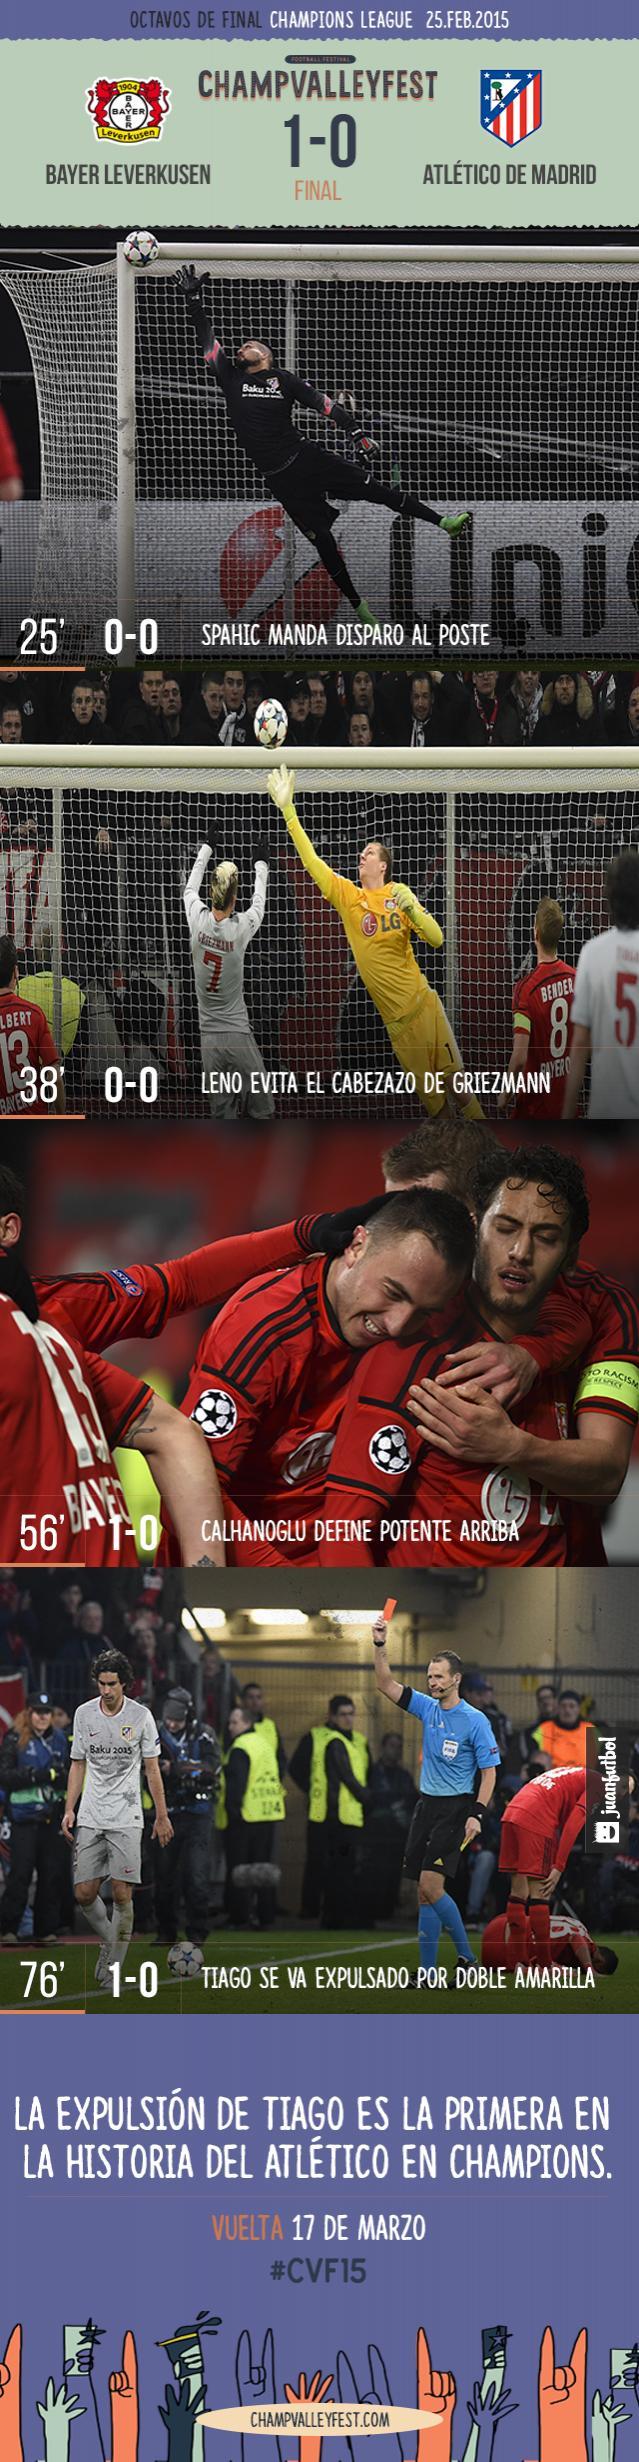 Leverkusen-Atlético de Madrid